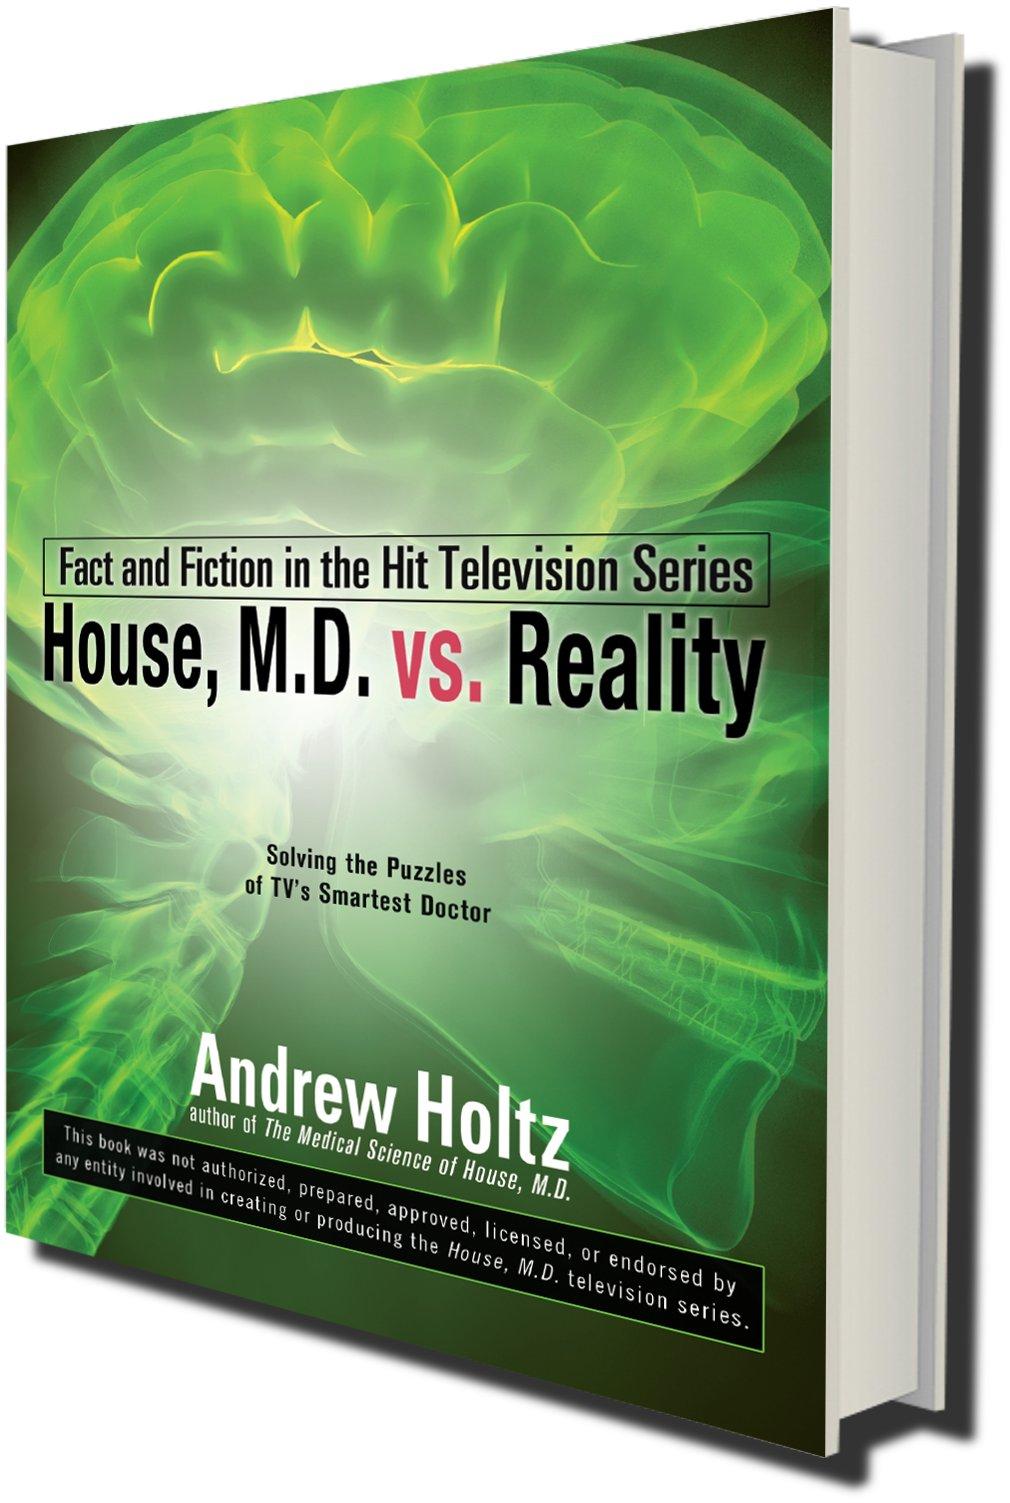 House, M.D. vs. Reality